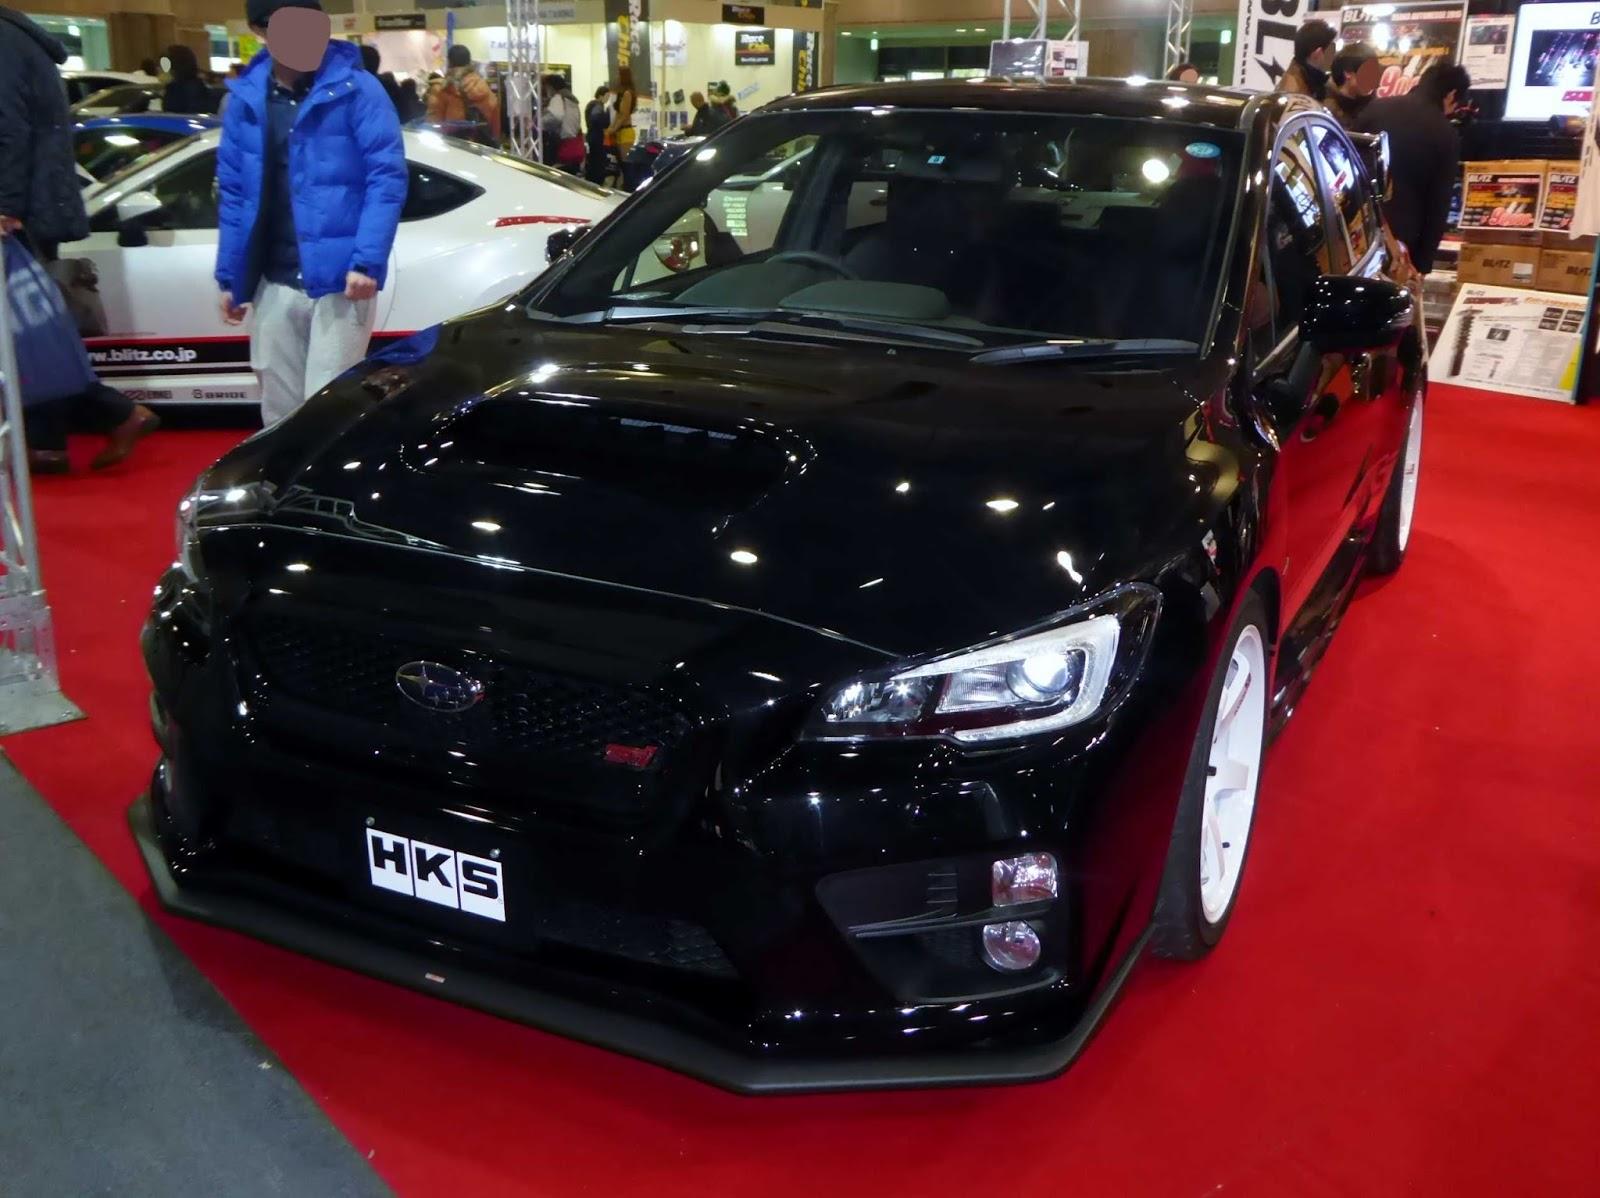 Wrx Performance Parts >> Subaru WRX Modification - Car Modification